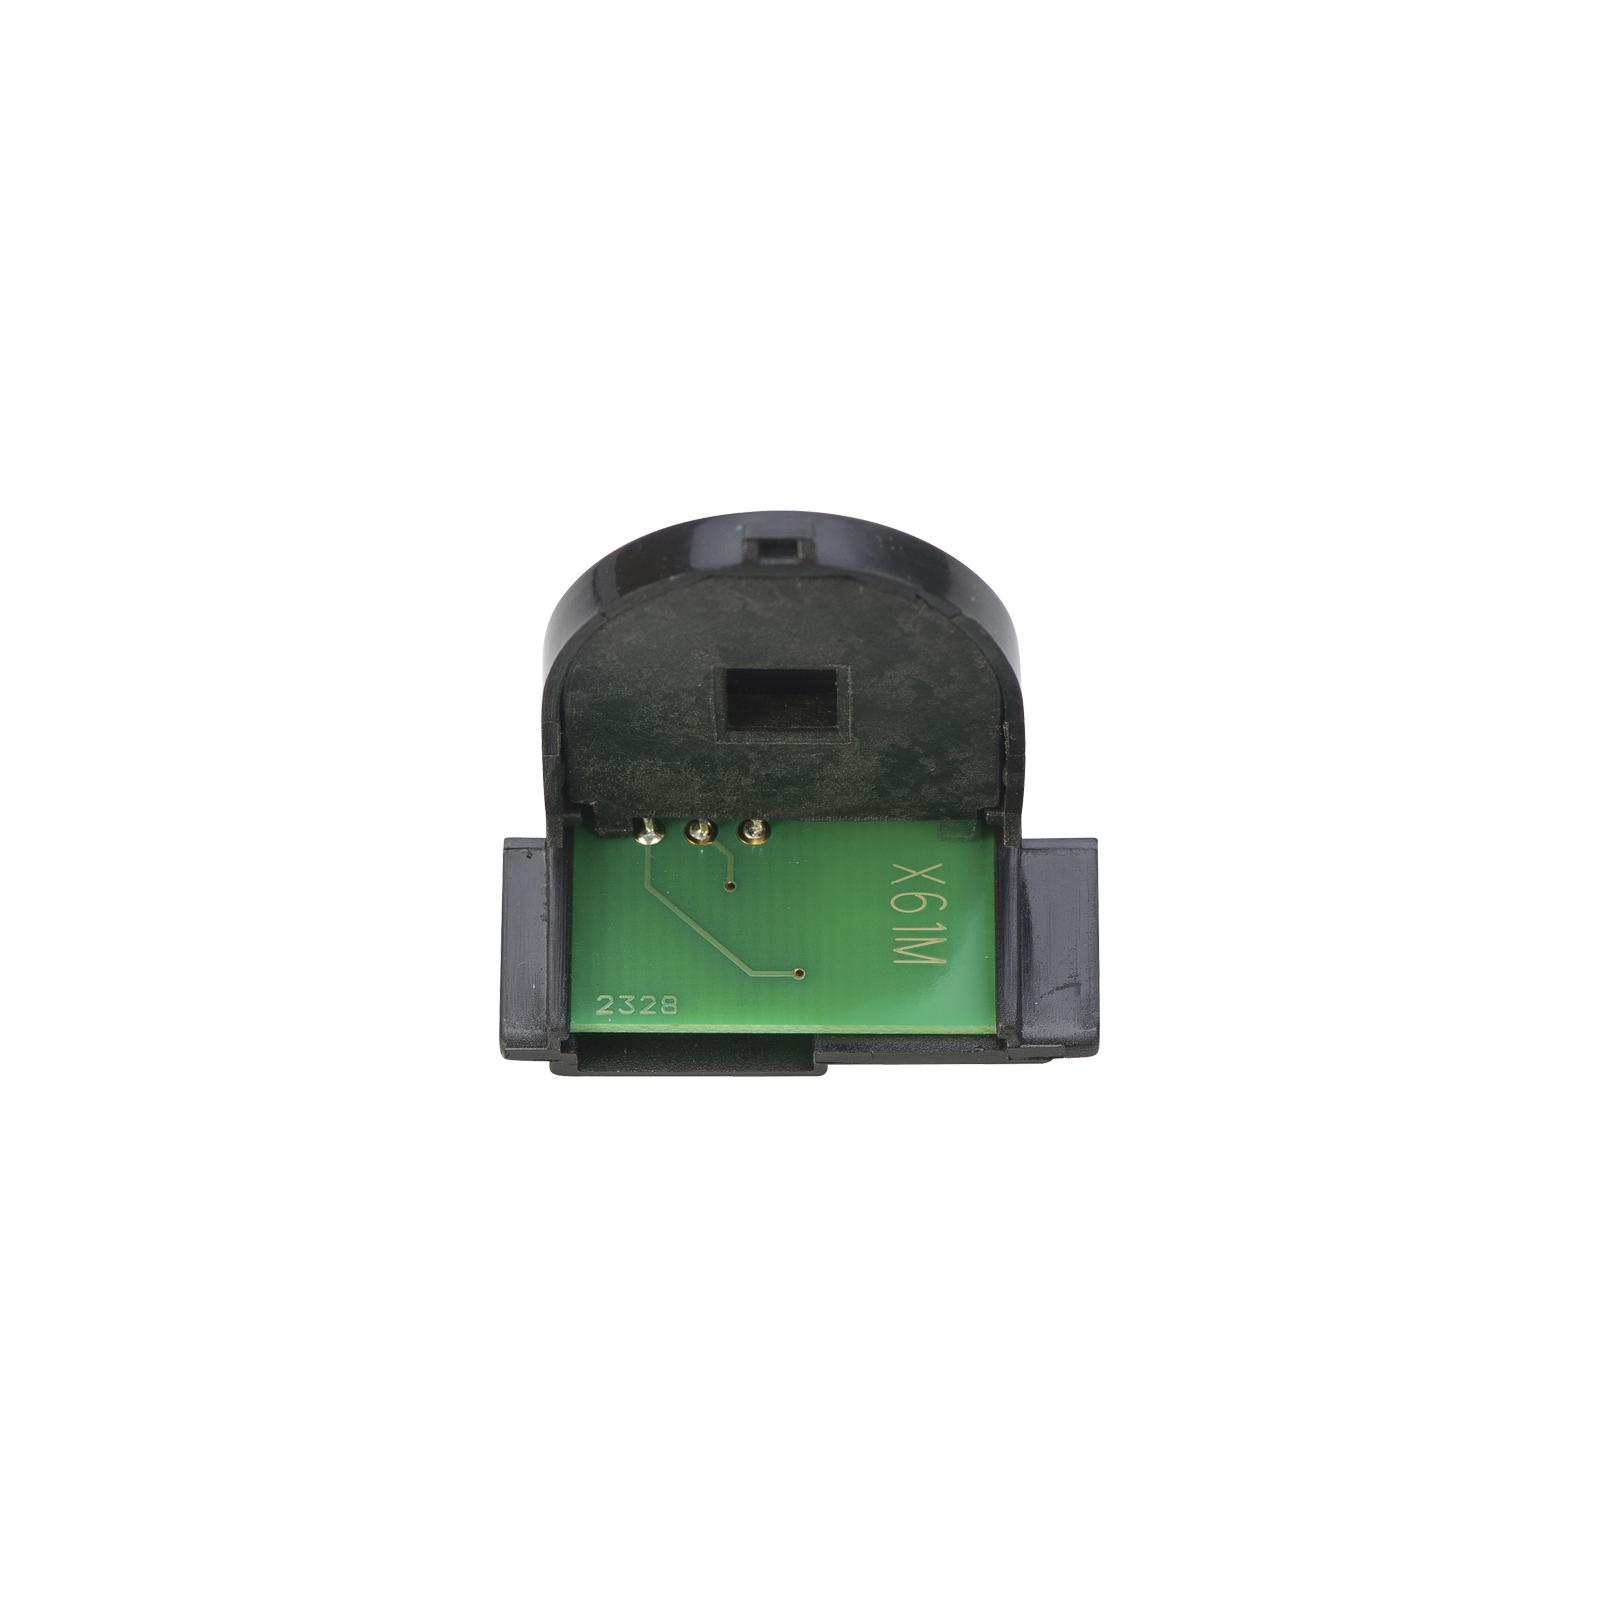 Чип для картриджа XeroxPhaser 6180/6180 (113R00724) 6k magenta Static Control (X6180CHIP-MA)